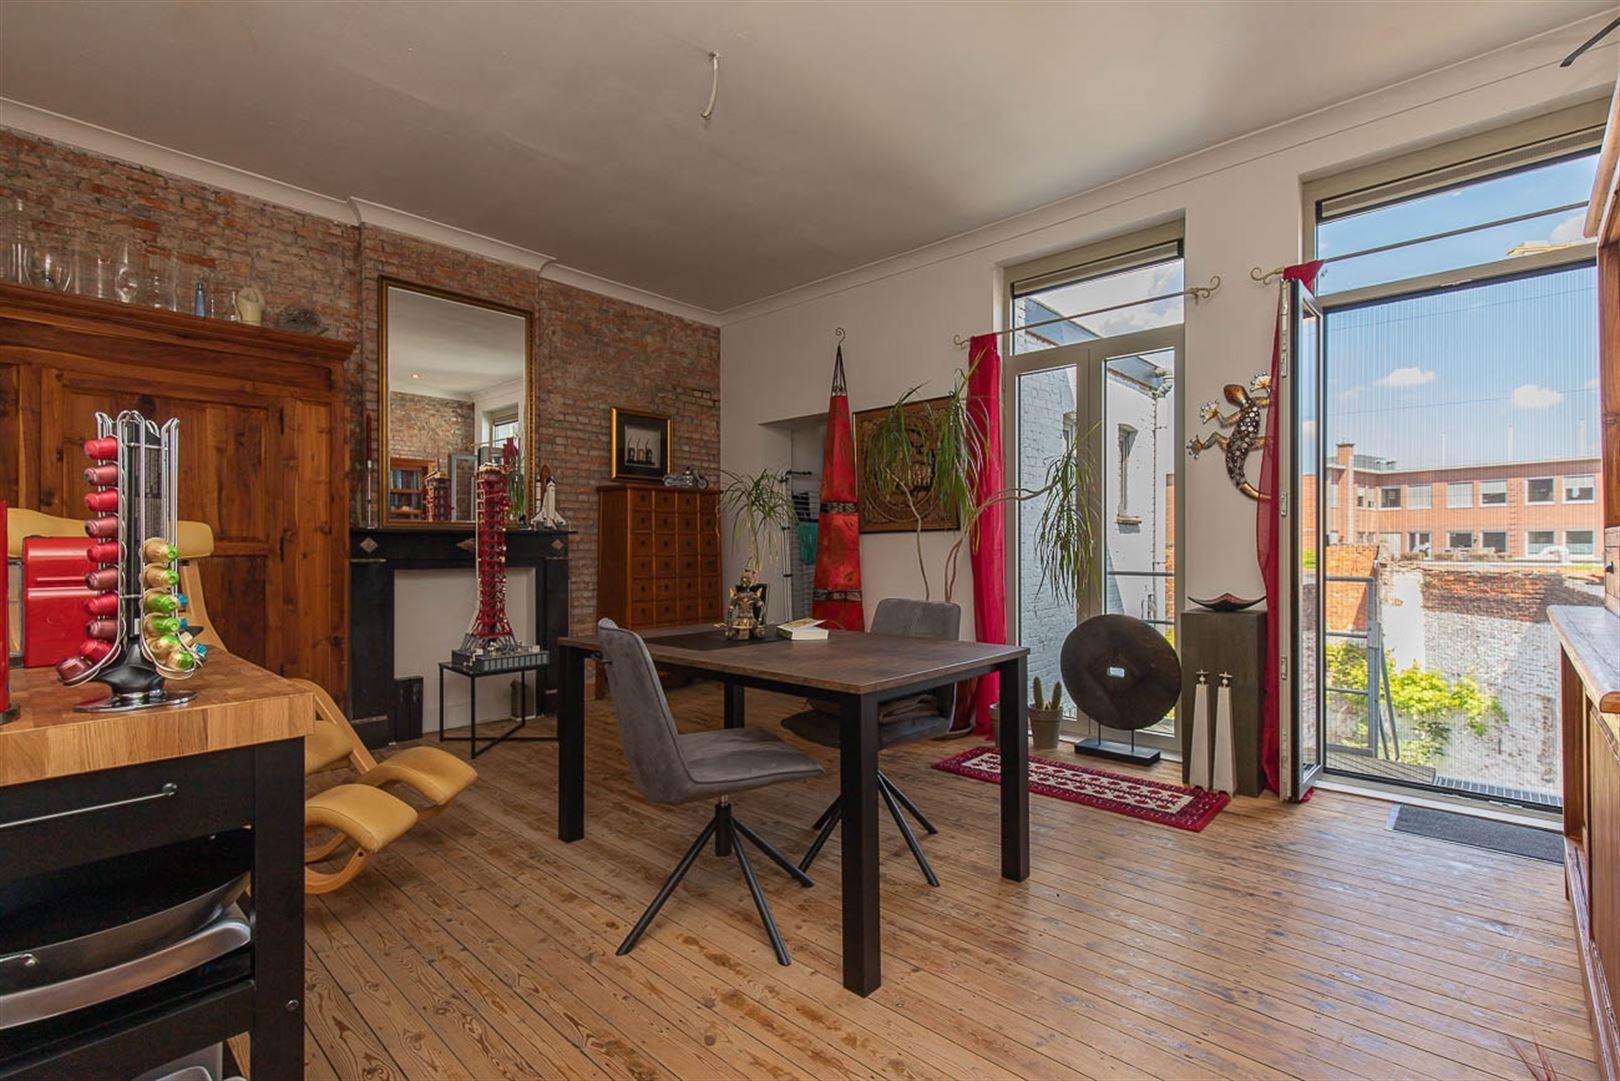 Foto 16 : Duplex/triplex te 9200 DENDERMONDE (België) - Prijs € 495.000